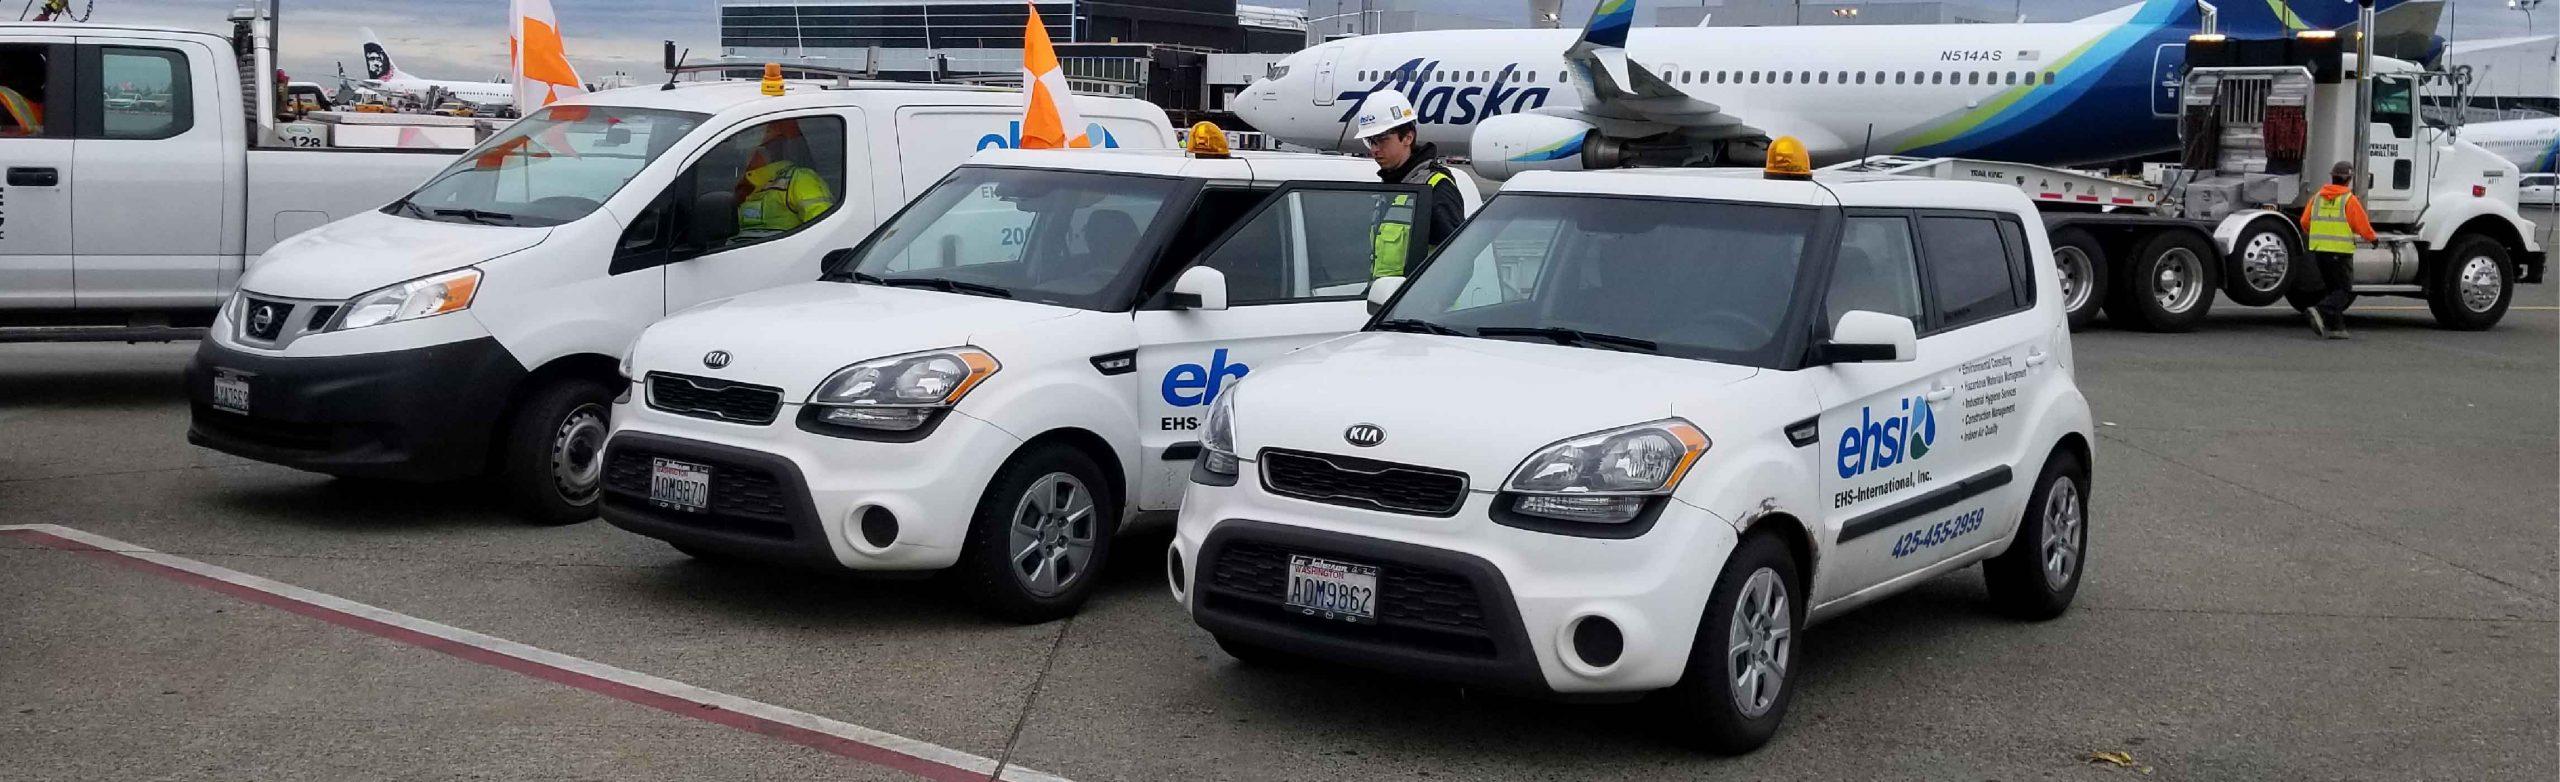 EHSI Vehicles